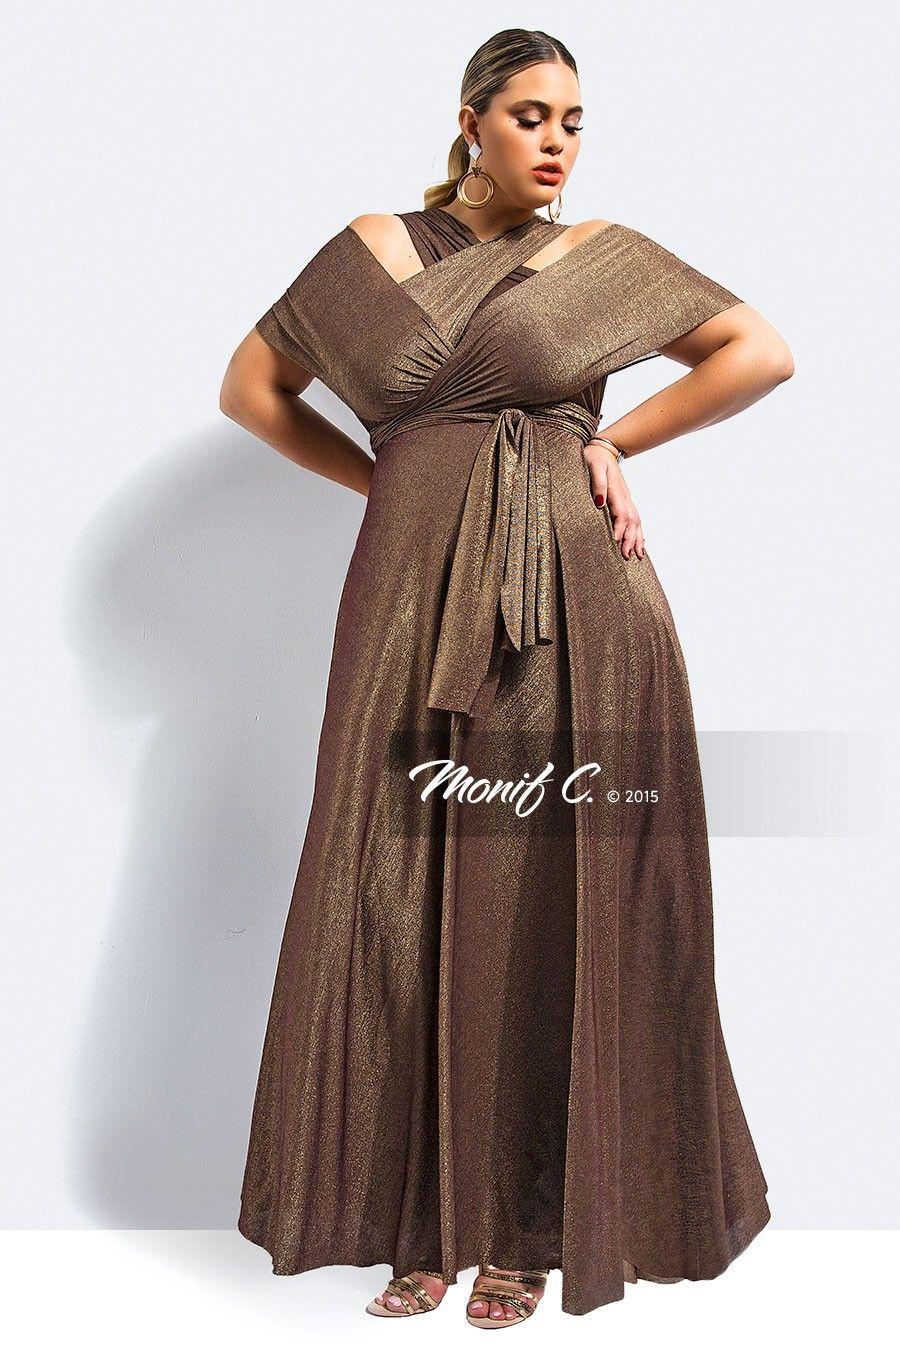 Monif c plus size clothing beautiful woman pinterest size